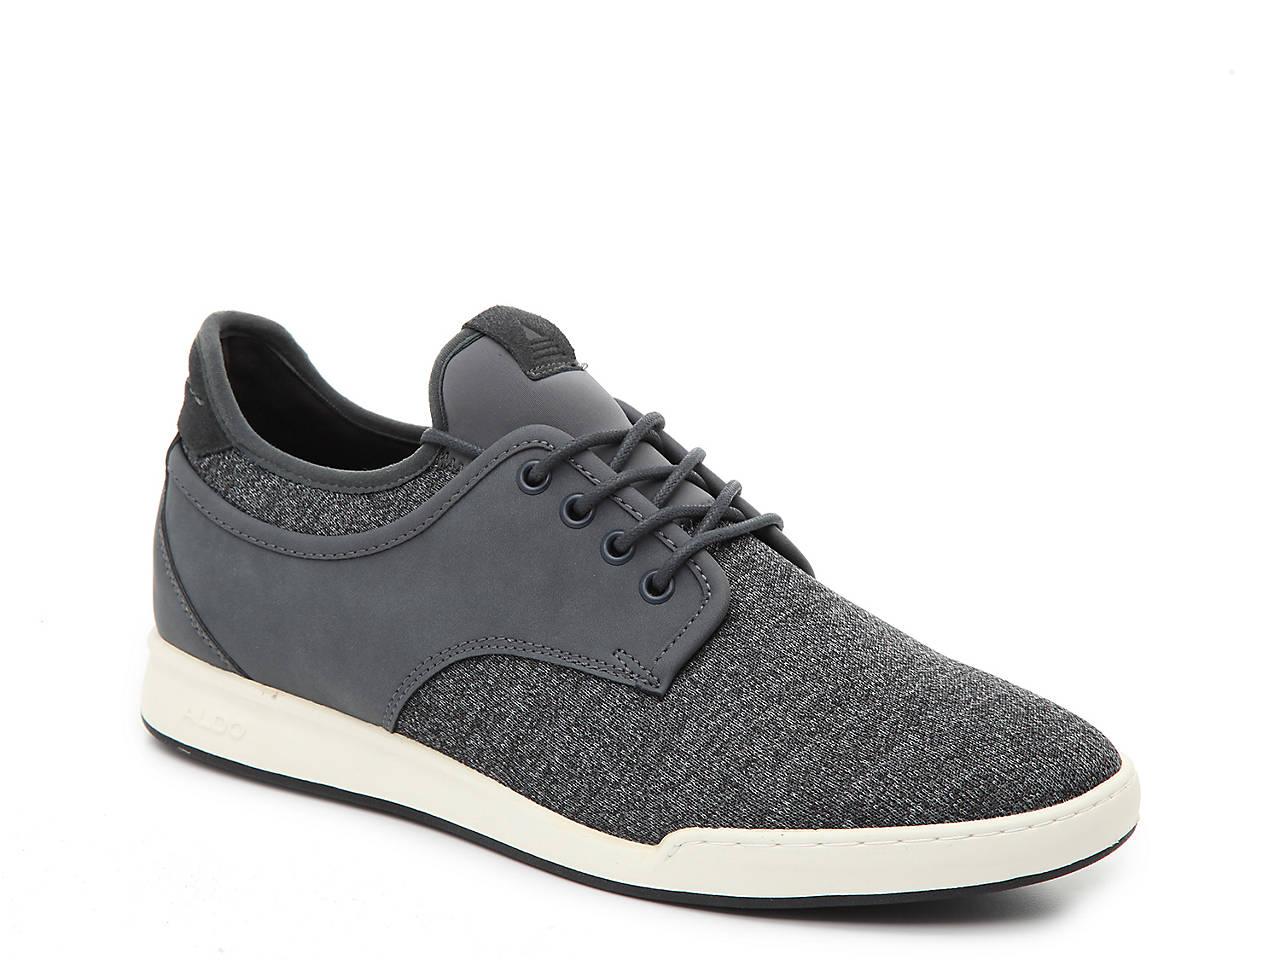 a456d7ac974267 Aldo Presure Sneaker Men s Shoes